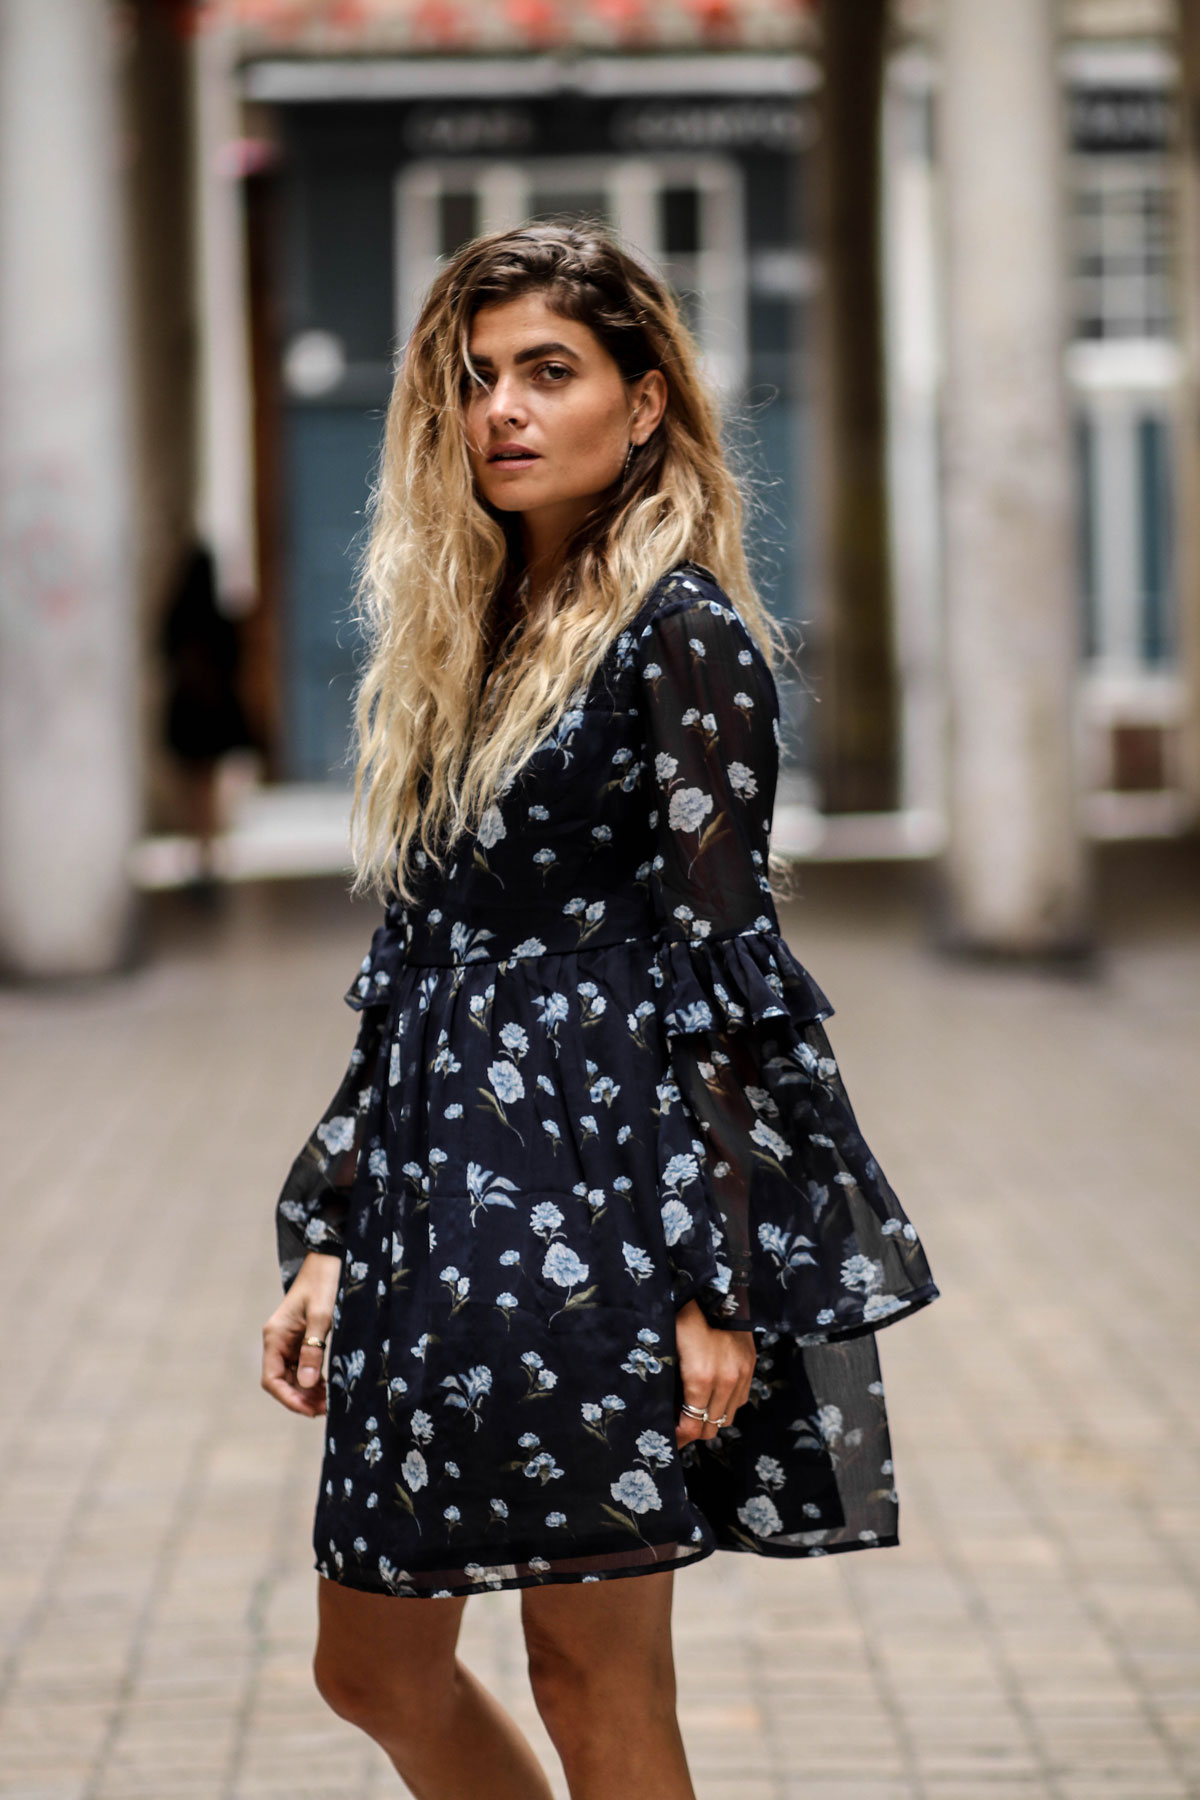 Robe fleuries New Look blog mode marieandmood